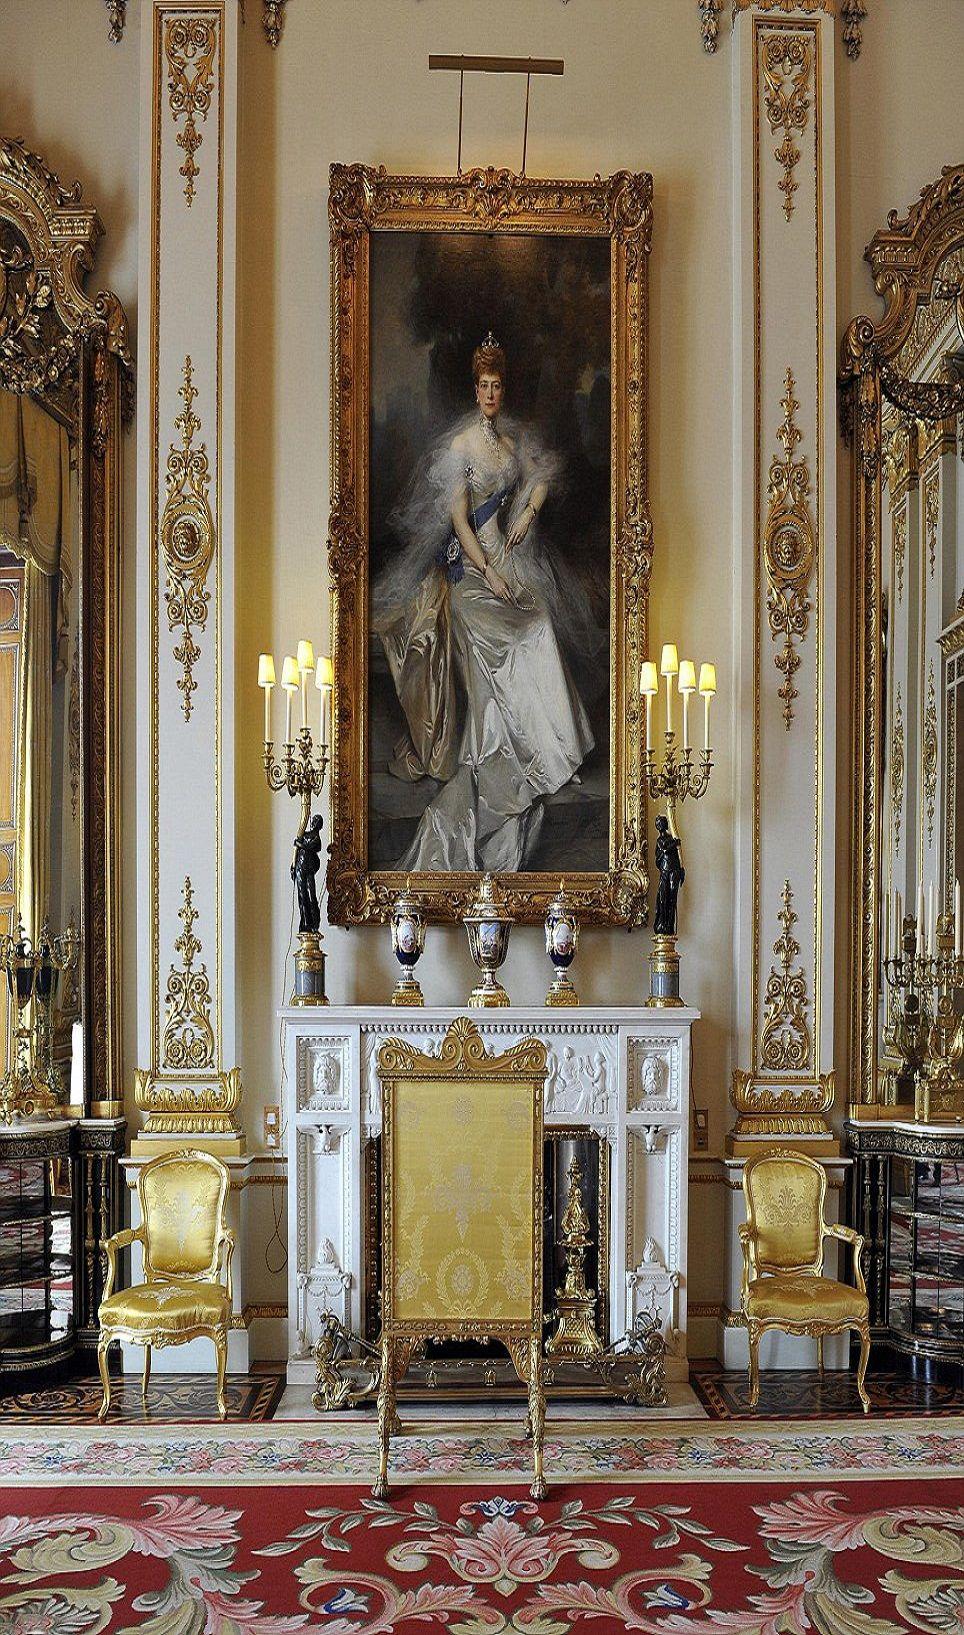 Inside the Buckingham Palace - A portrait of Edward VII's ...